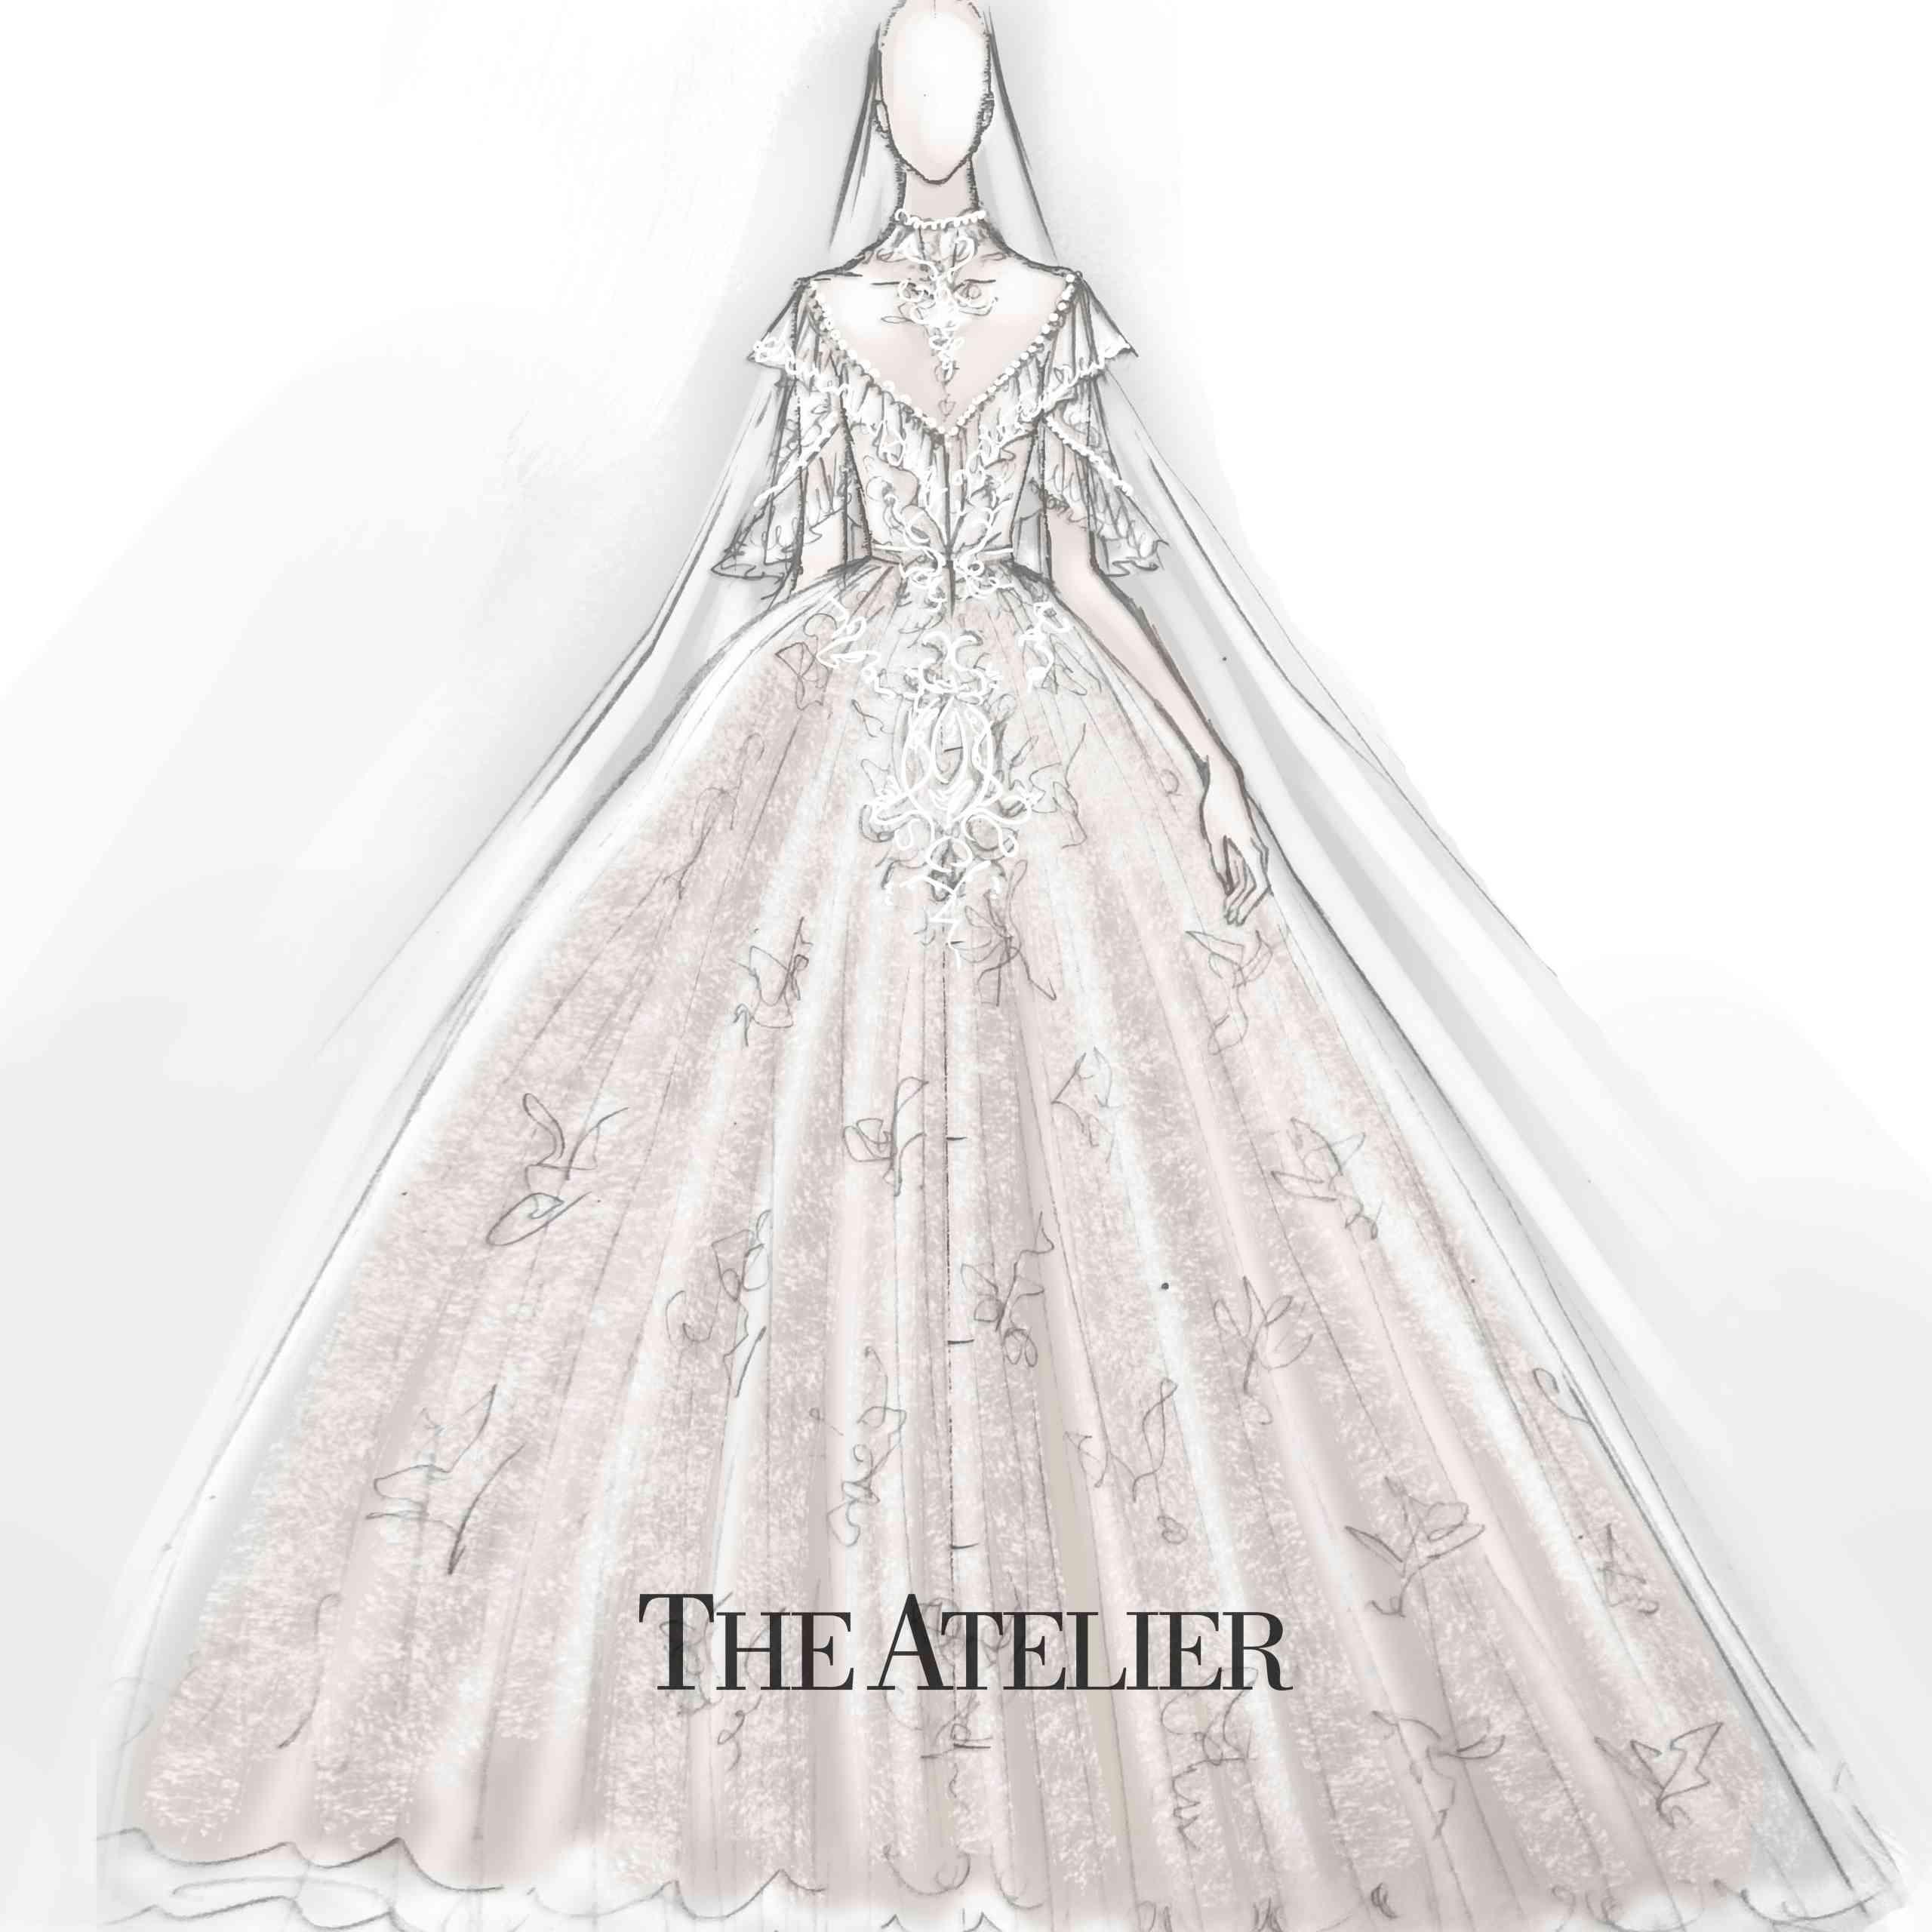 The Atelier Bridal Fashion Week Fall 2020 Sketch